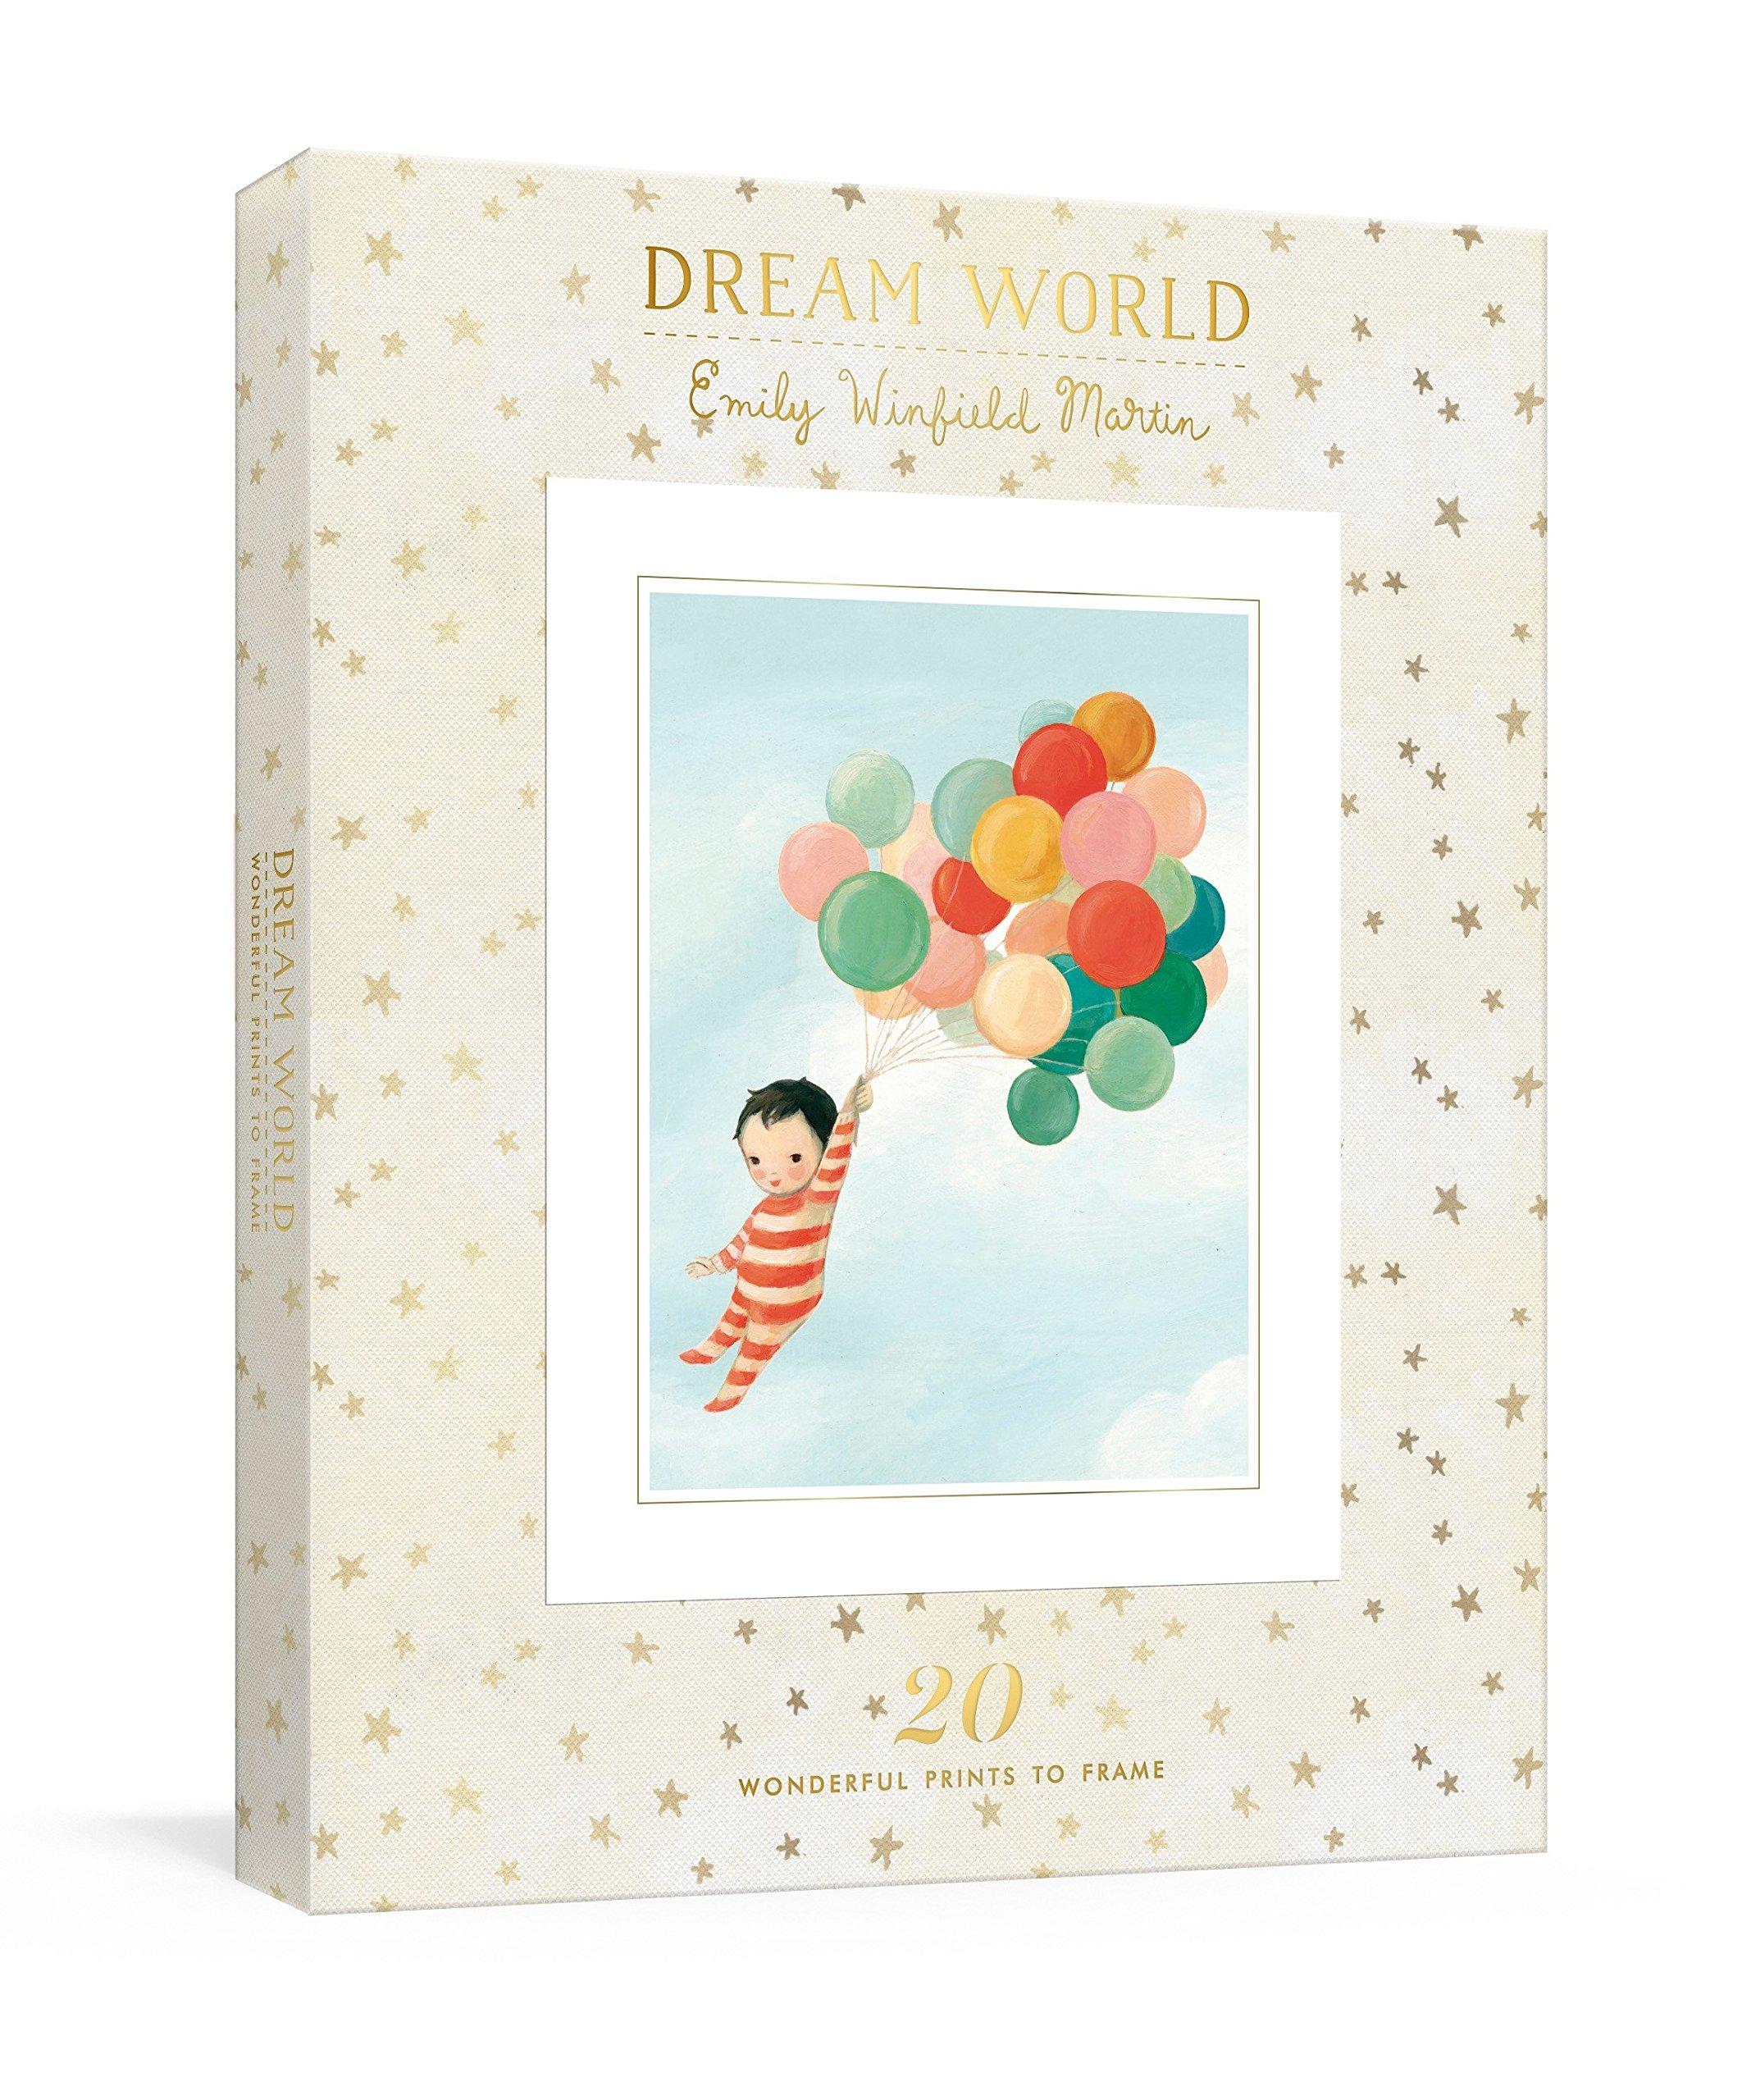 Dream World: 20 Wonderful Prints to Frame